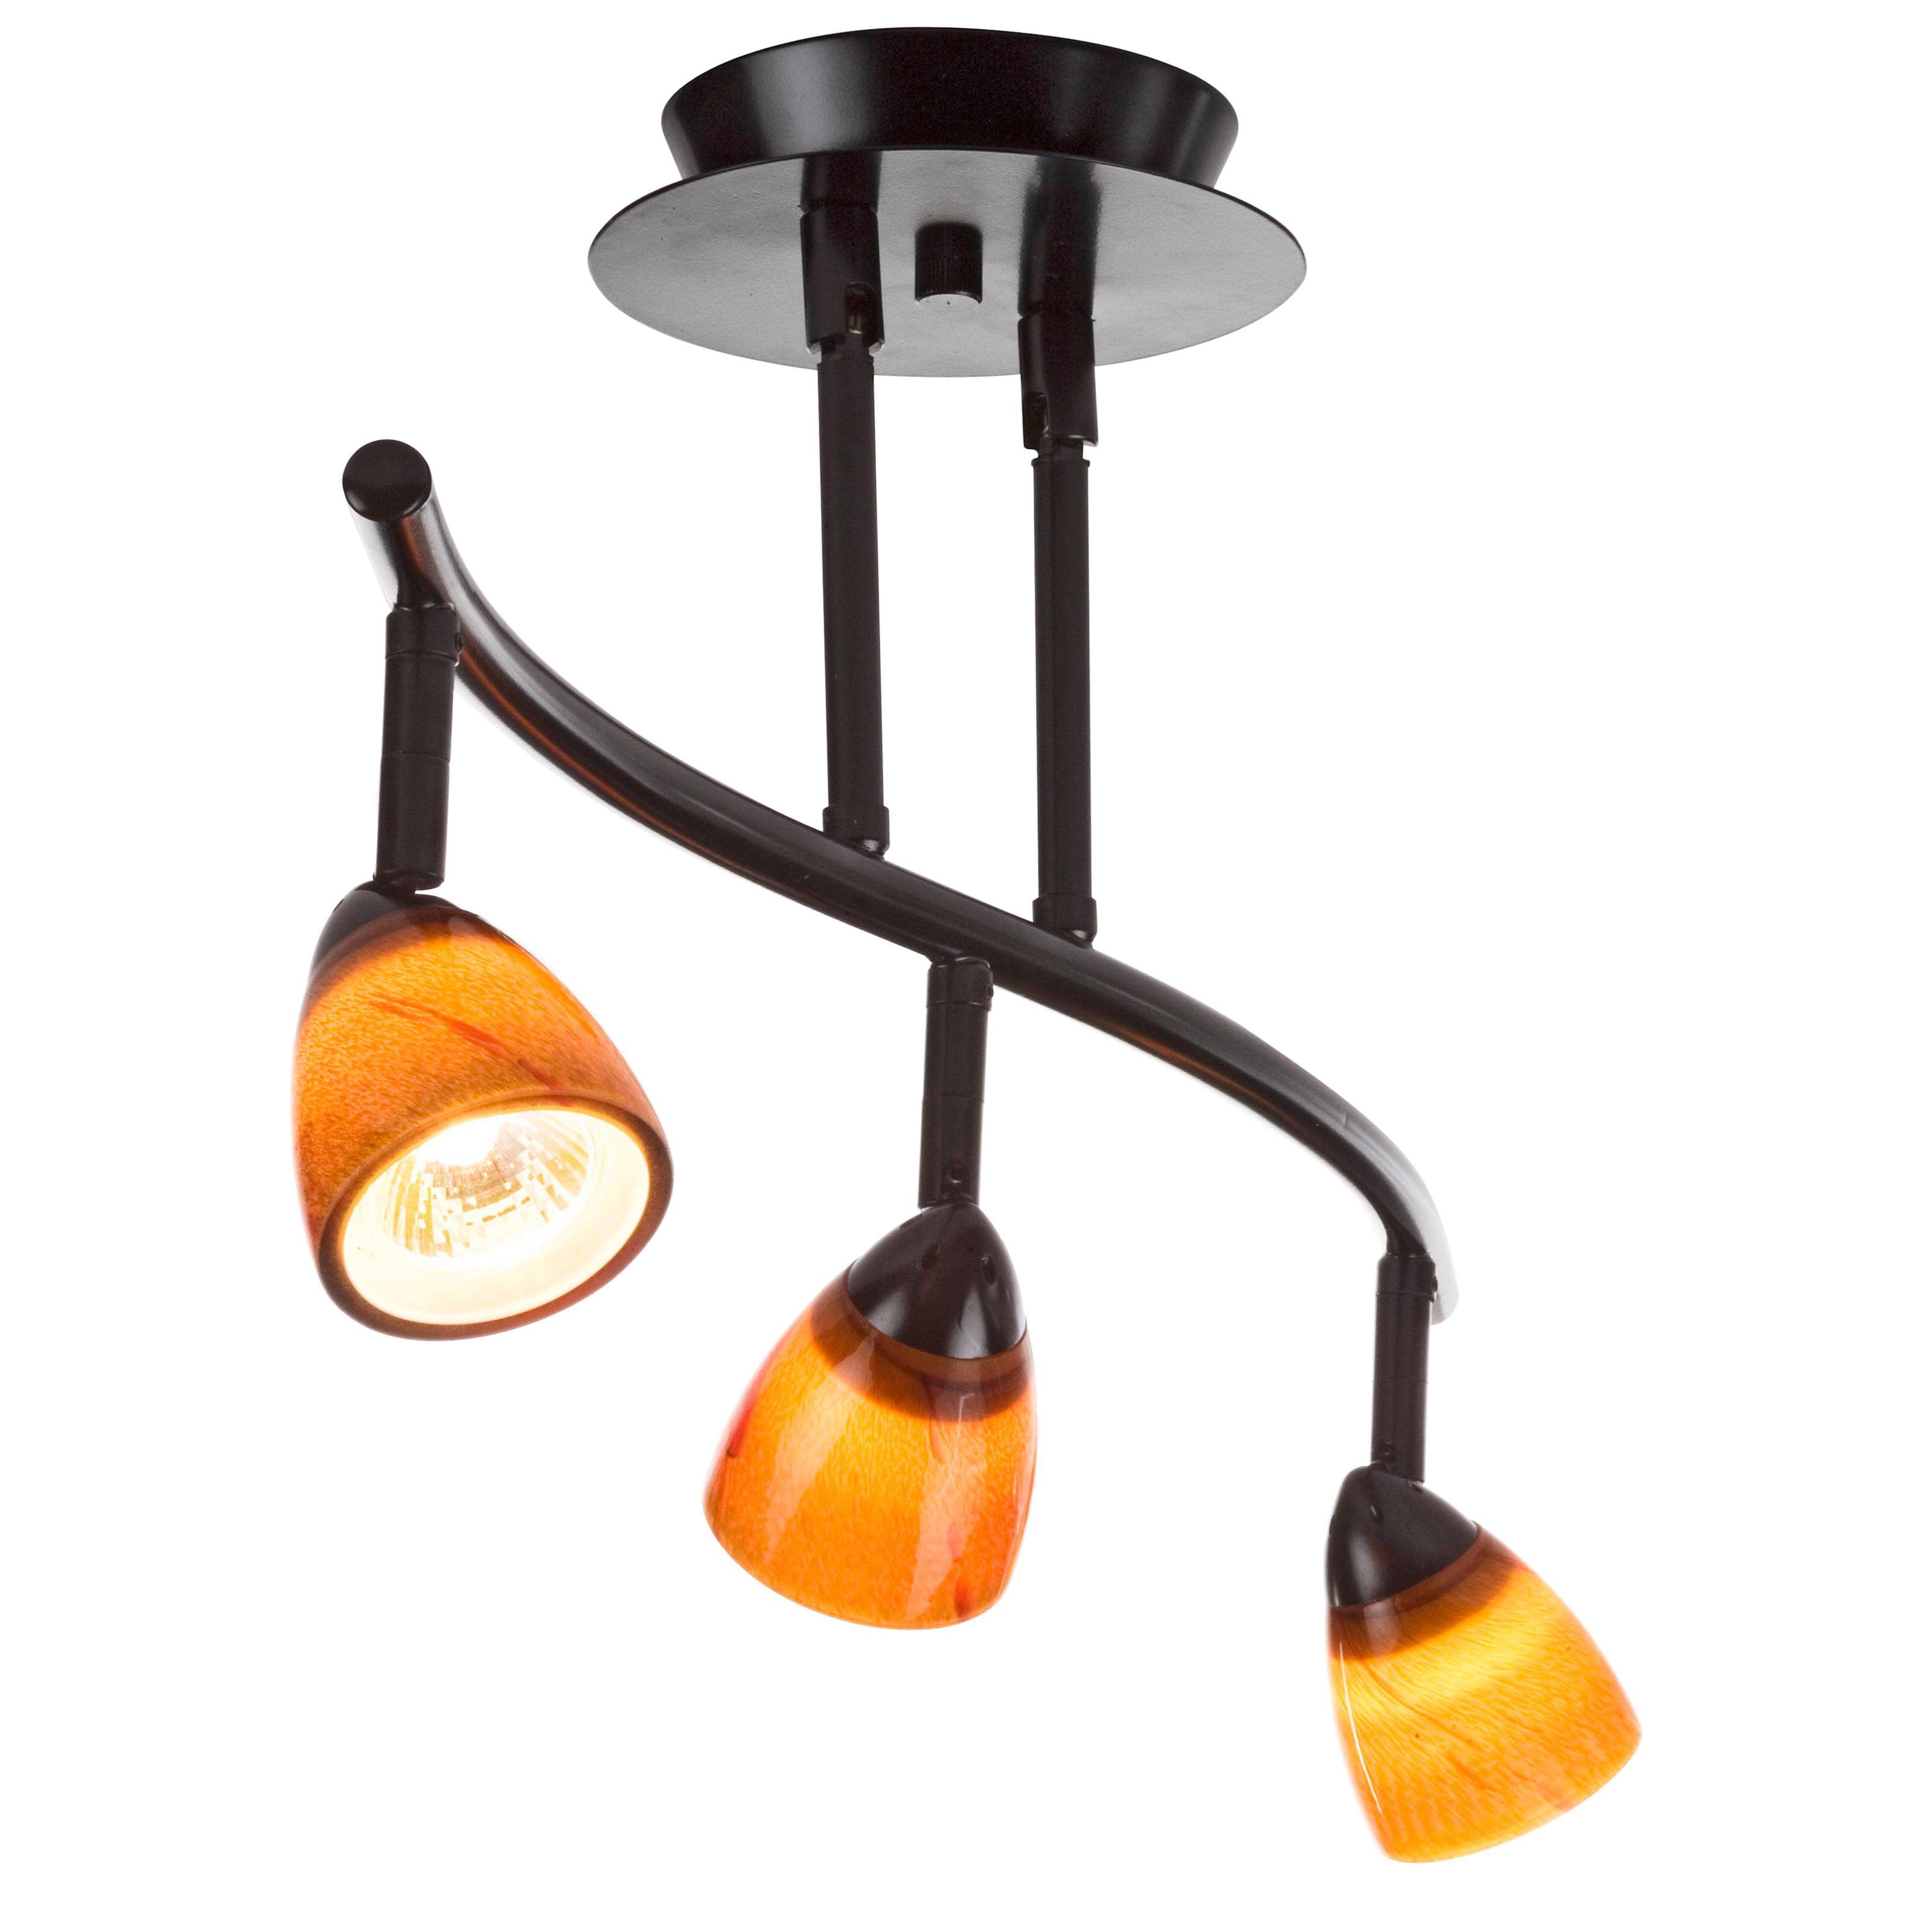 Cal Lighting Serpentine Rail Light Bar - 3 Heads